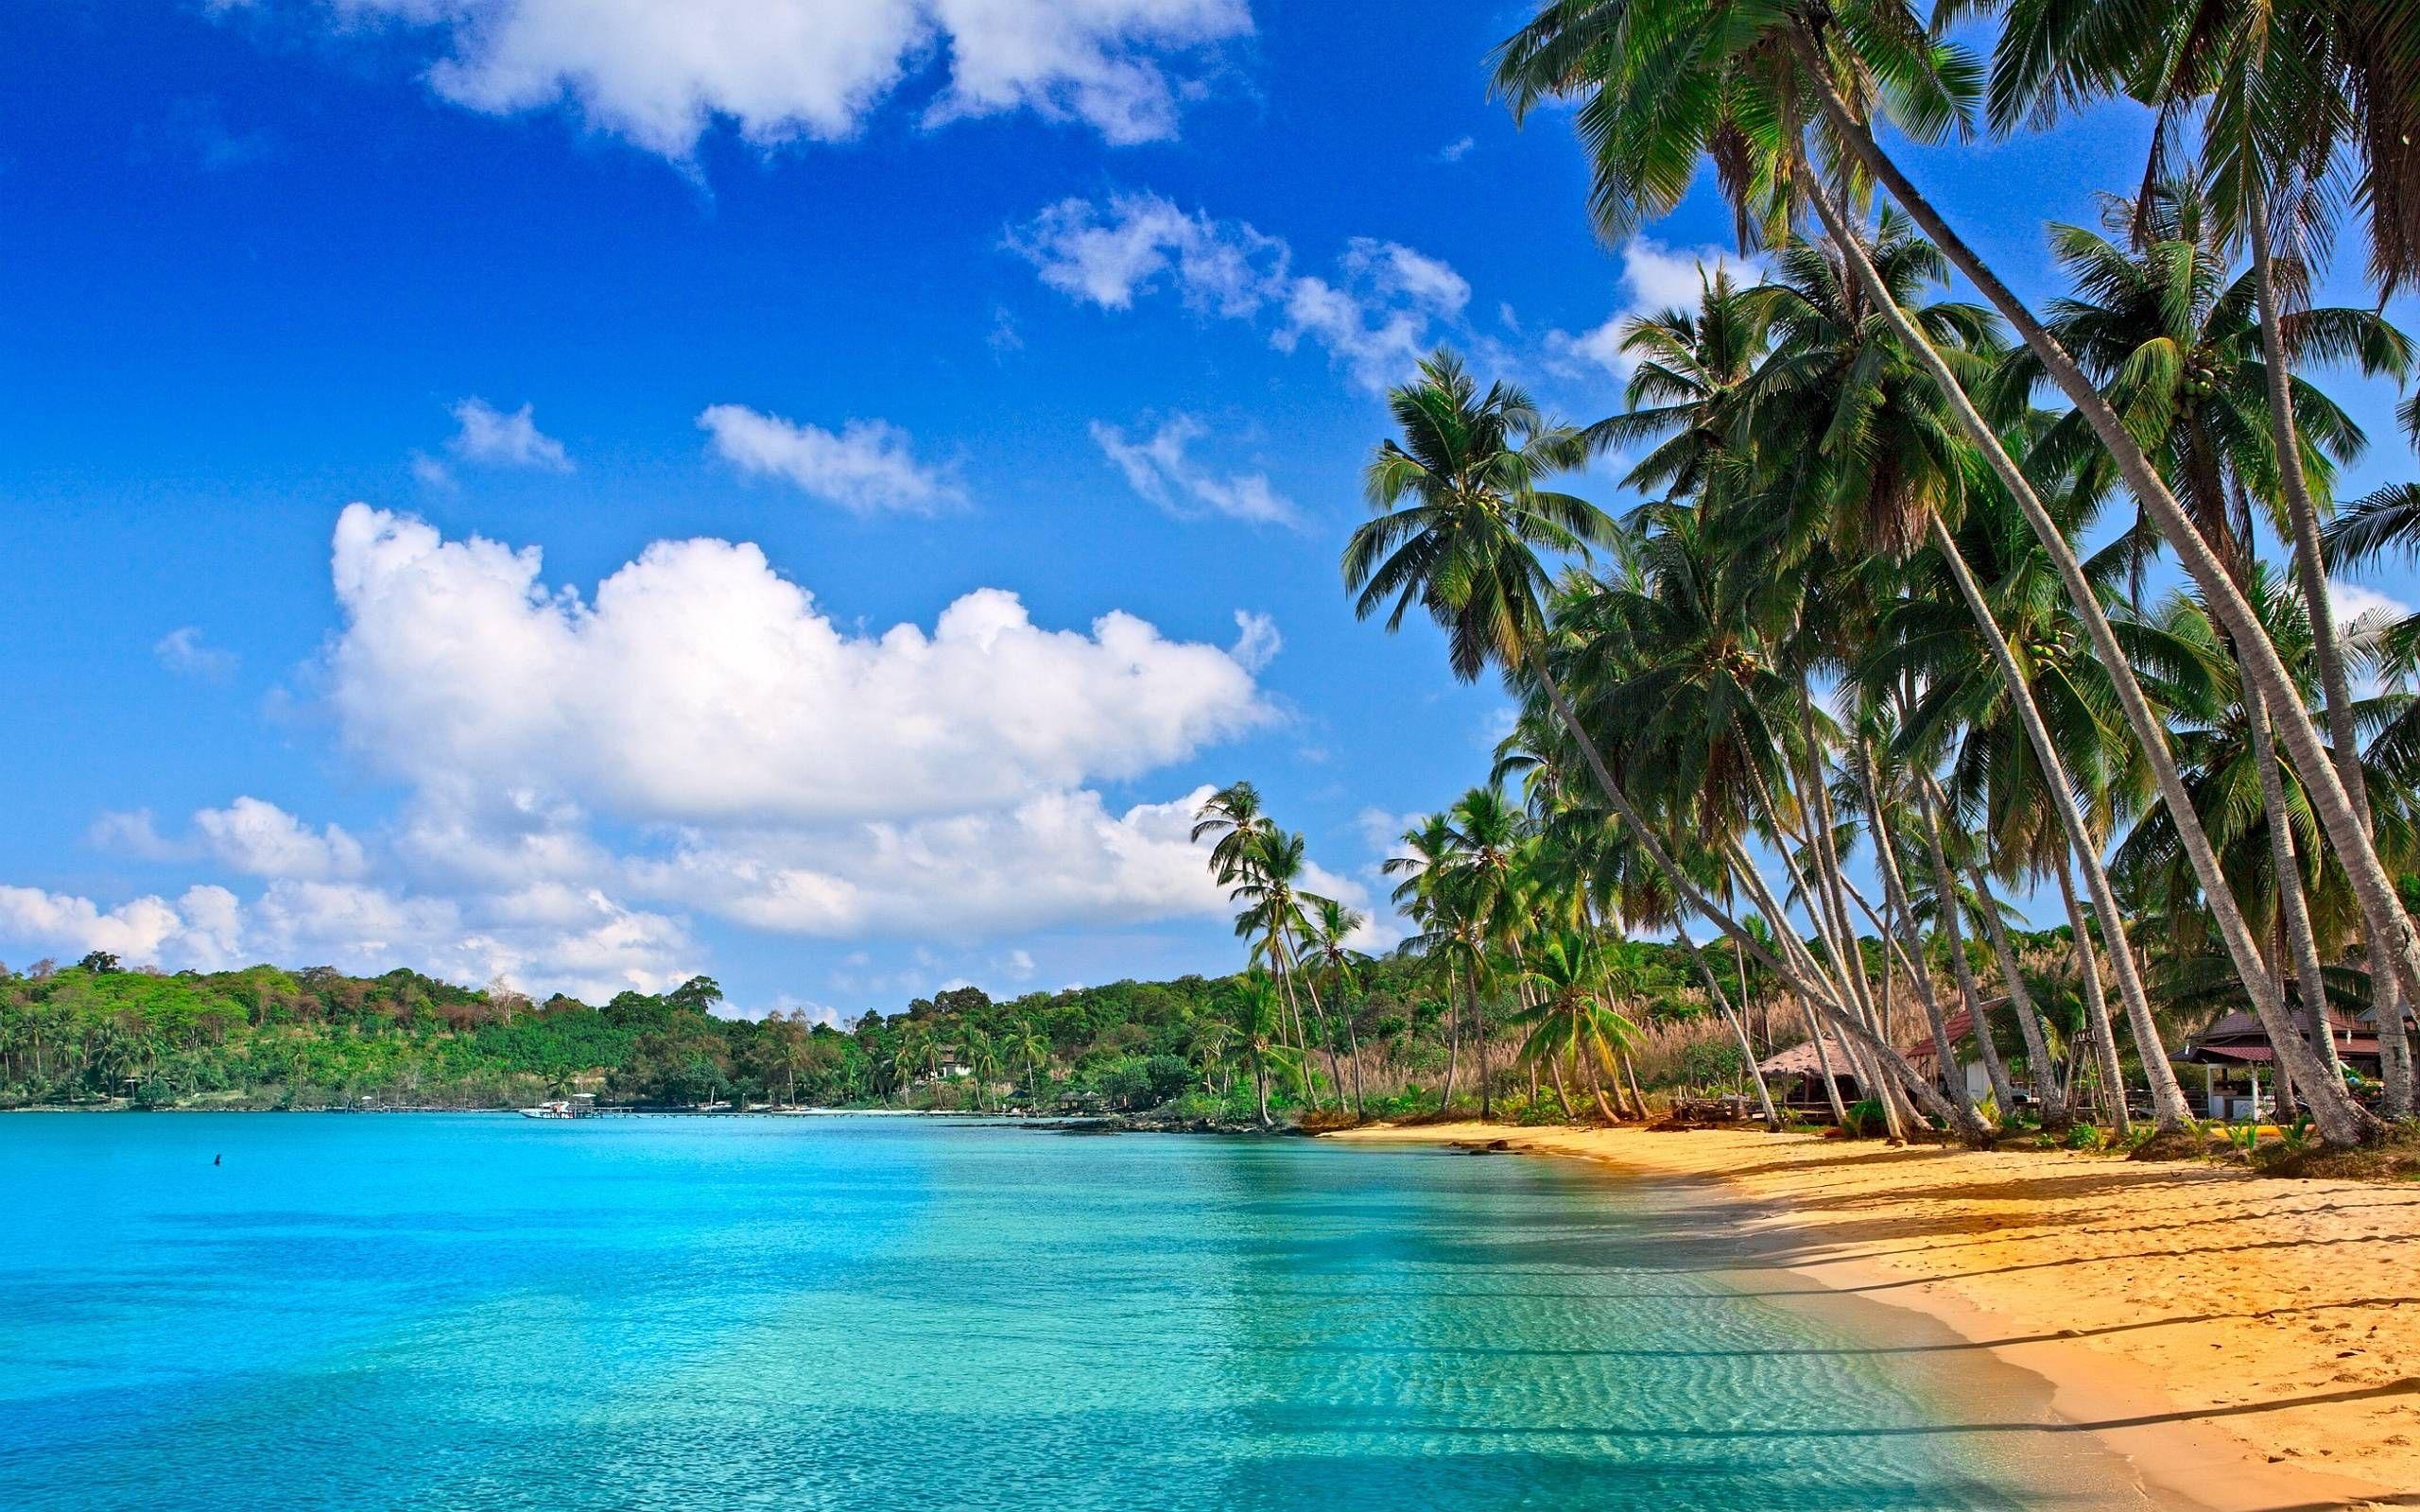 Tropical Beach Paradise 4k Ultra Hd Desktop Wallpaper Uploaded By Desktopwalls Beach Wallpaper Beach Pictures Wallpaper Tropical Background